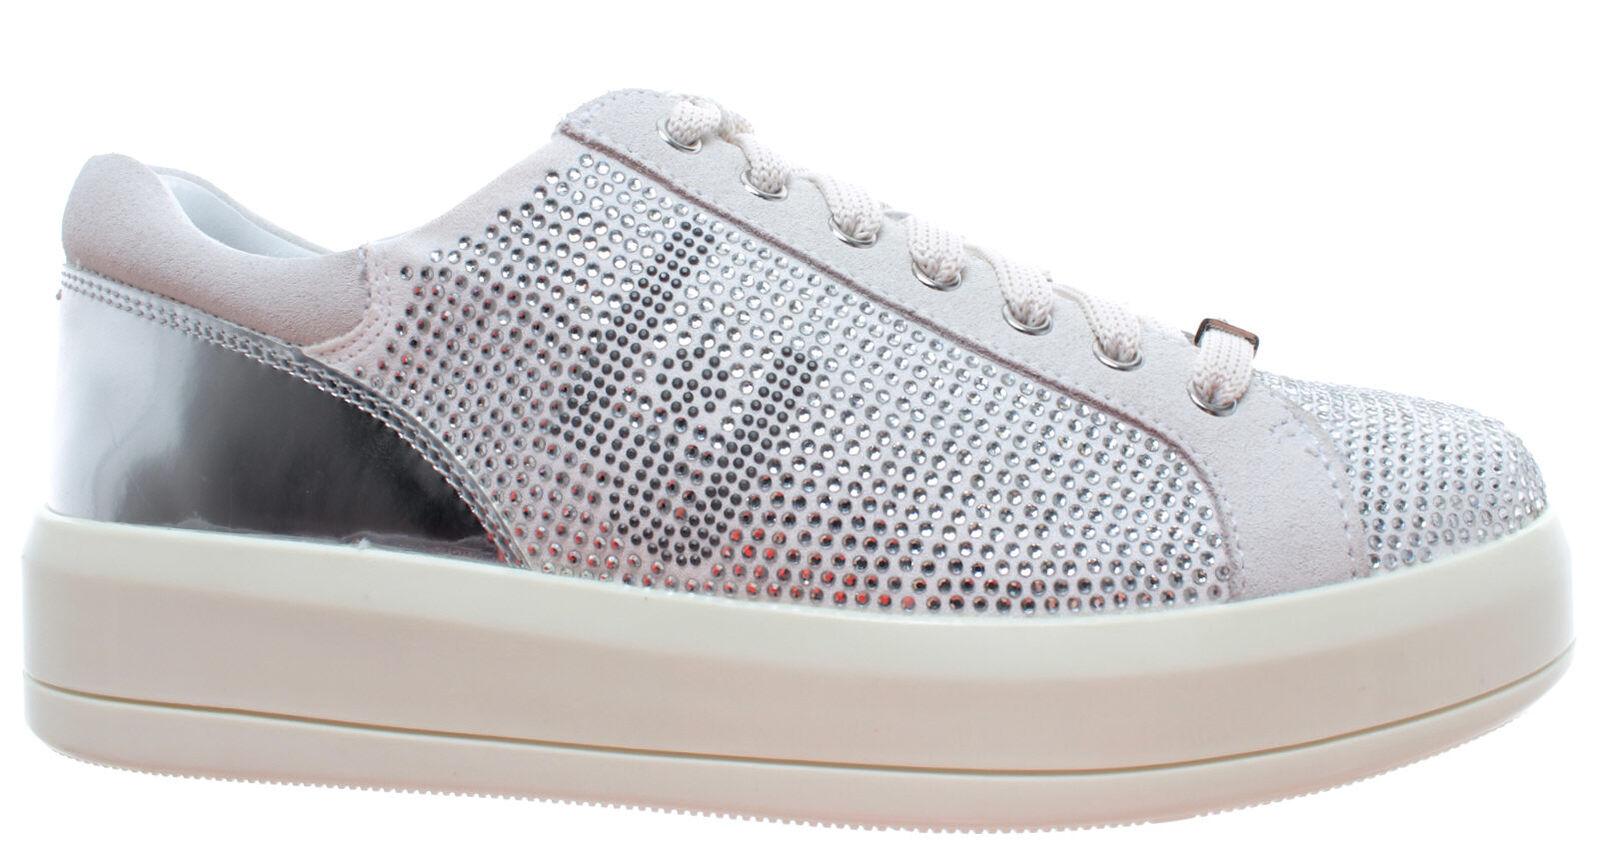 LIU JO Milano Women's shoes Sneakers Sneakers Sneakers Kim07 Lace Up Microfiber Cow Suede White 133467